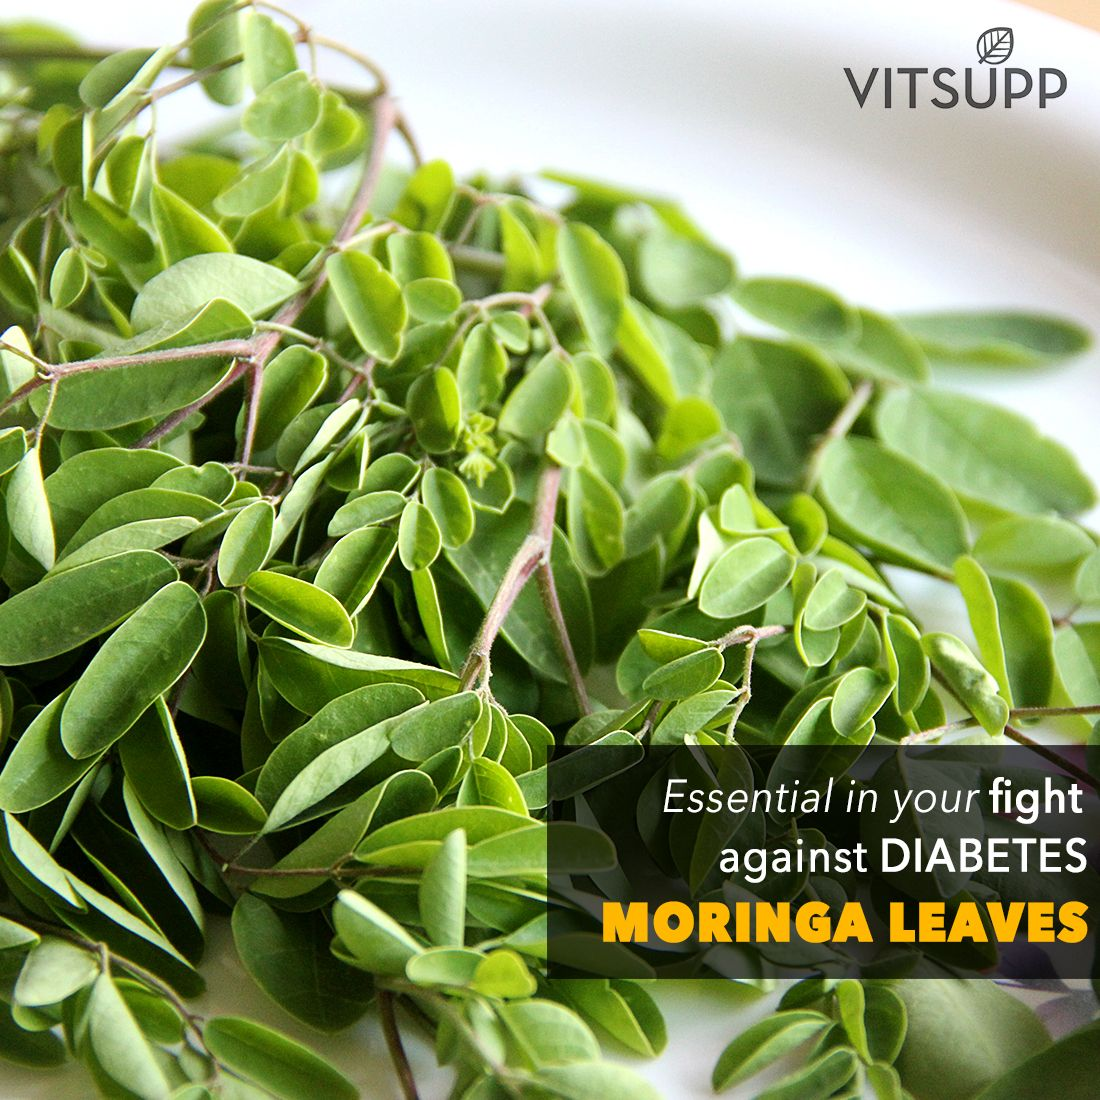 Drumstick Leaves Flowers Seeds Health Benefits And Side Effects Moringa Leaf Powder Moringa Moringa Leaves